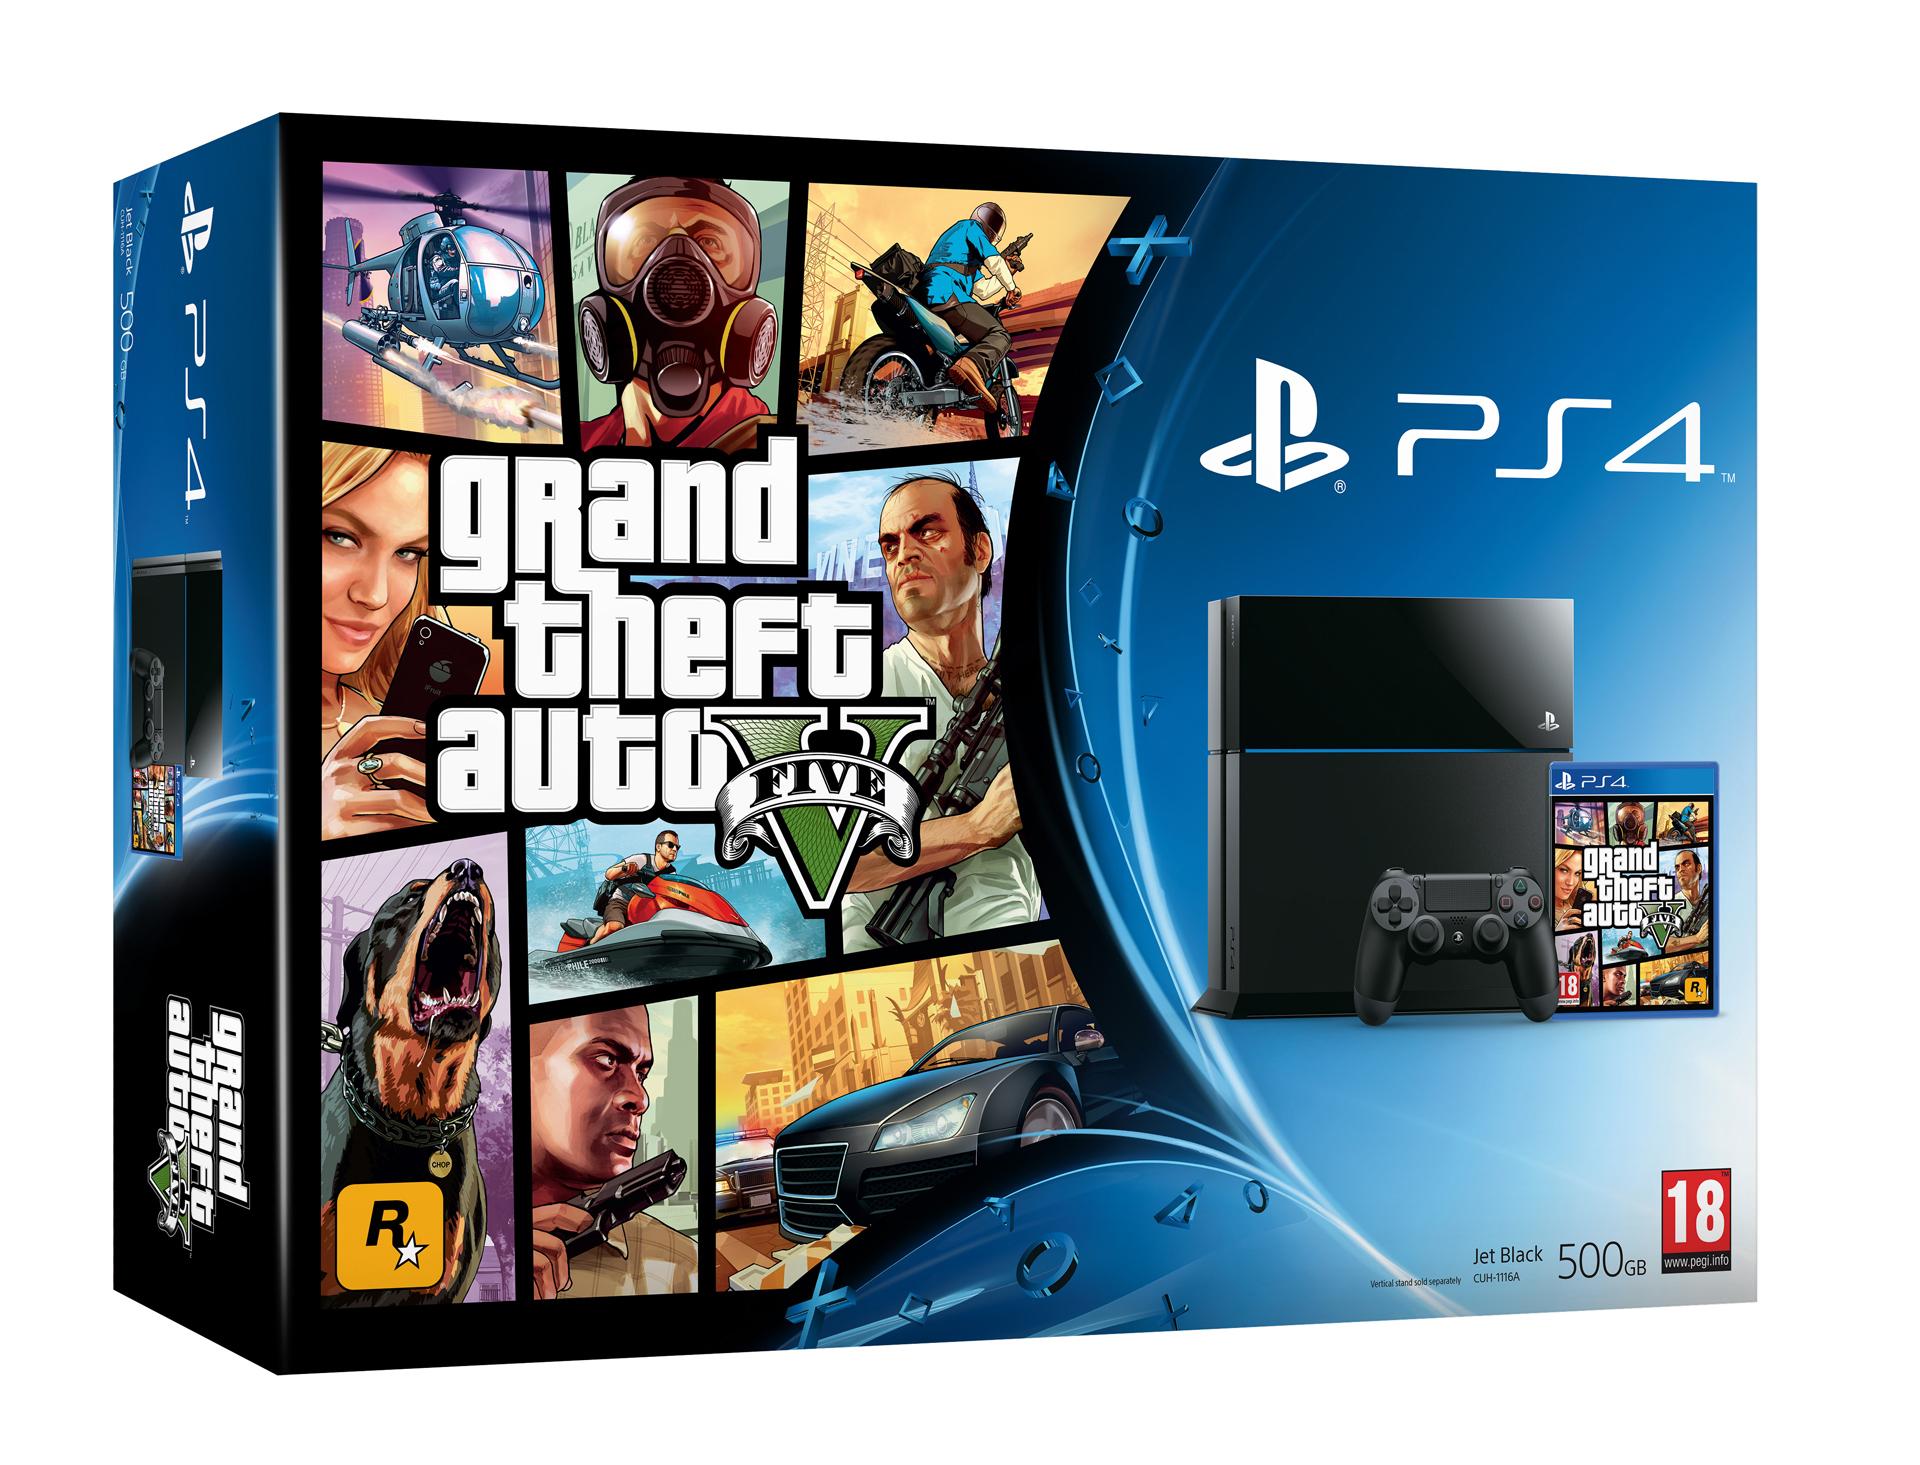 PS 4 500 GB Grand Theft Auto V Bundle Jet Black